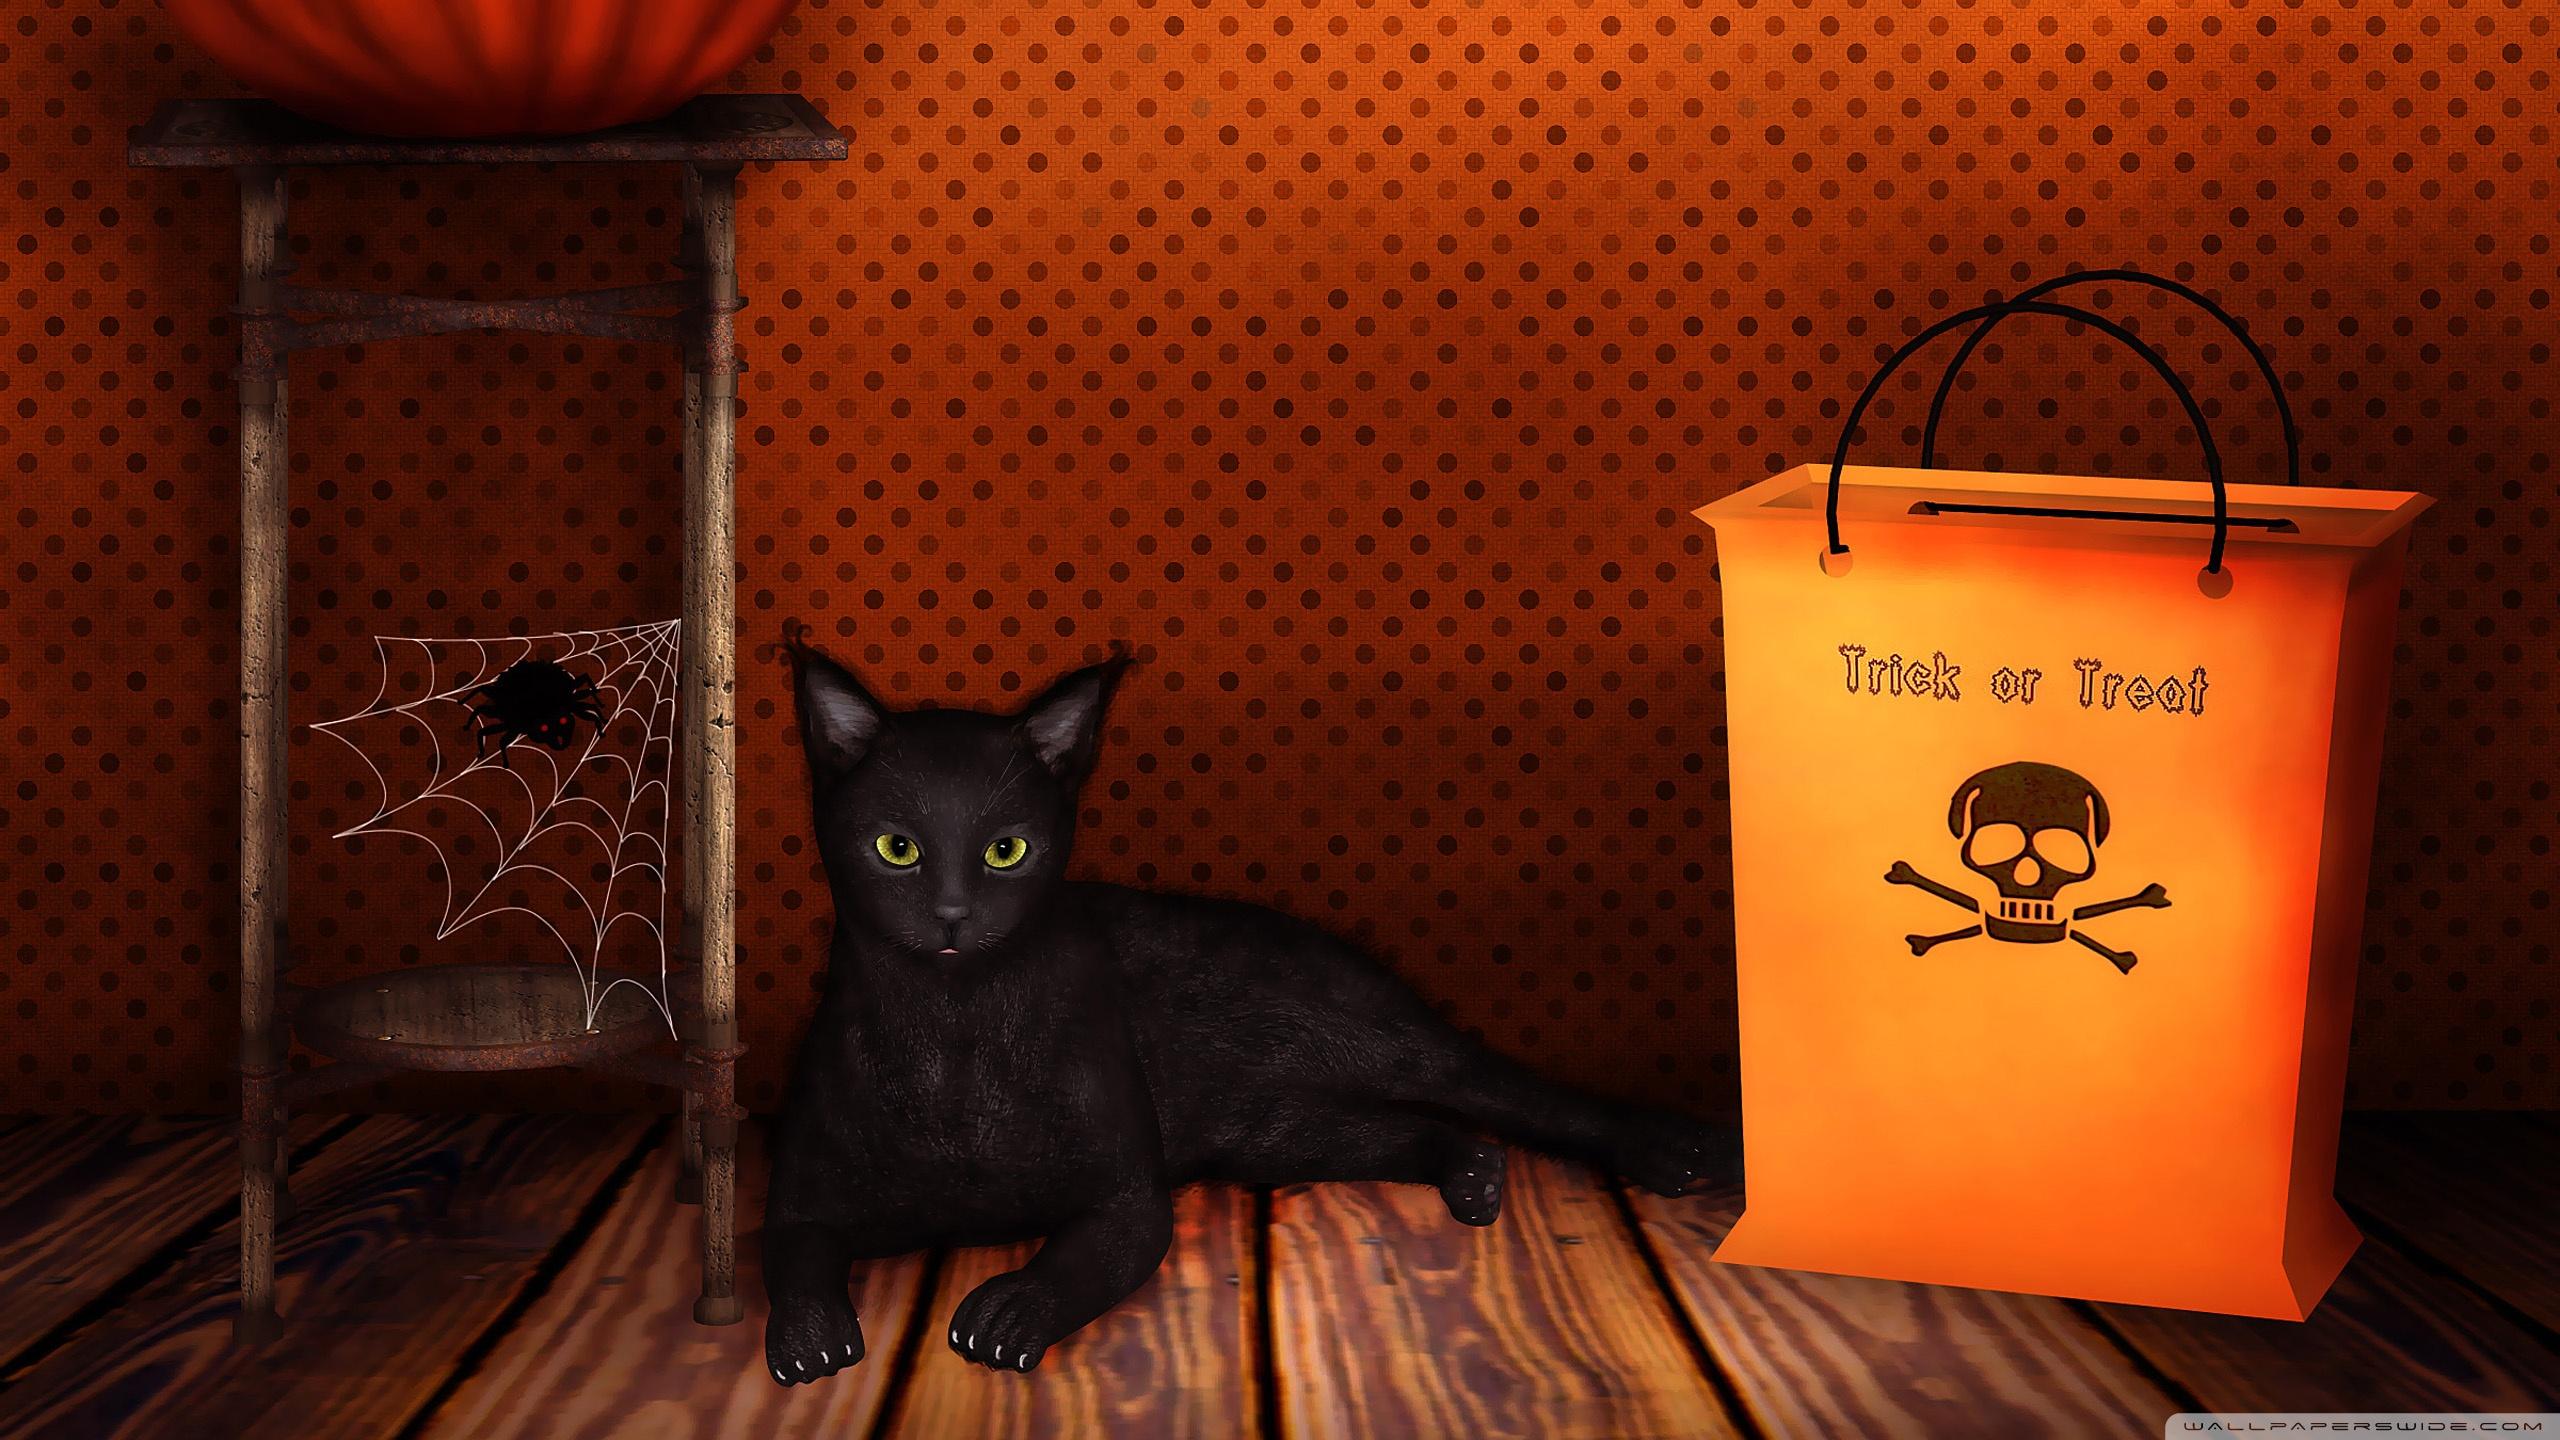 Gato negro de halloween - 2560x1440